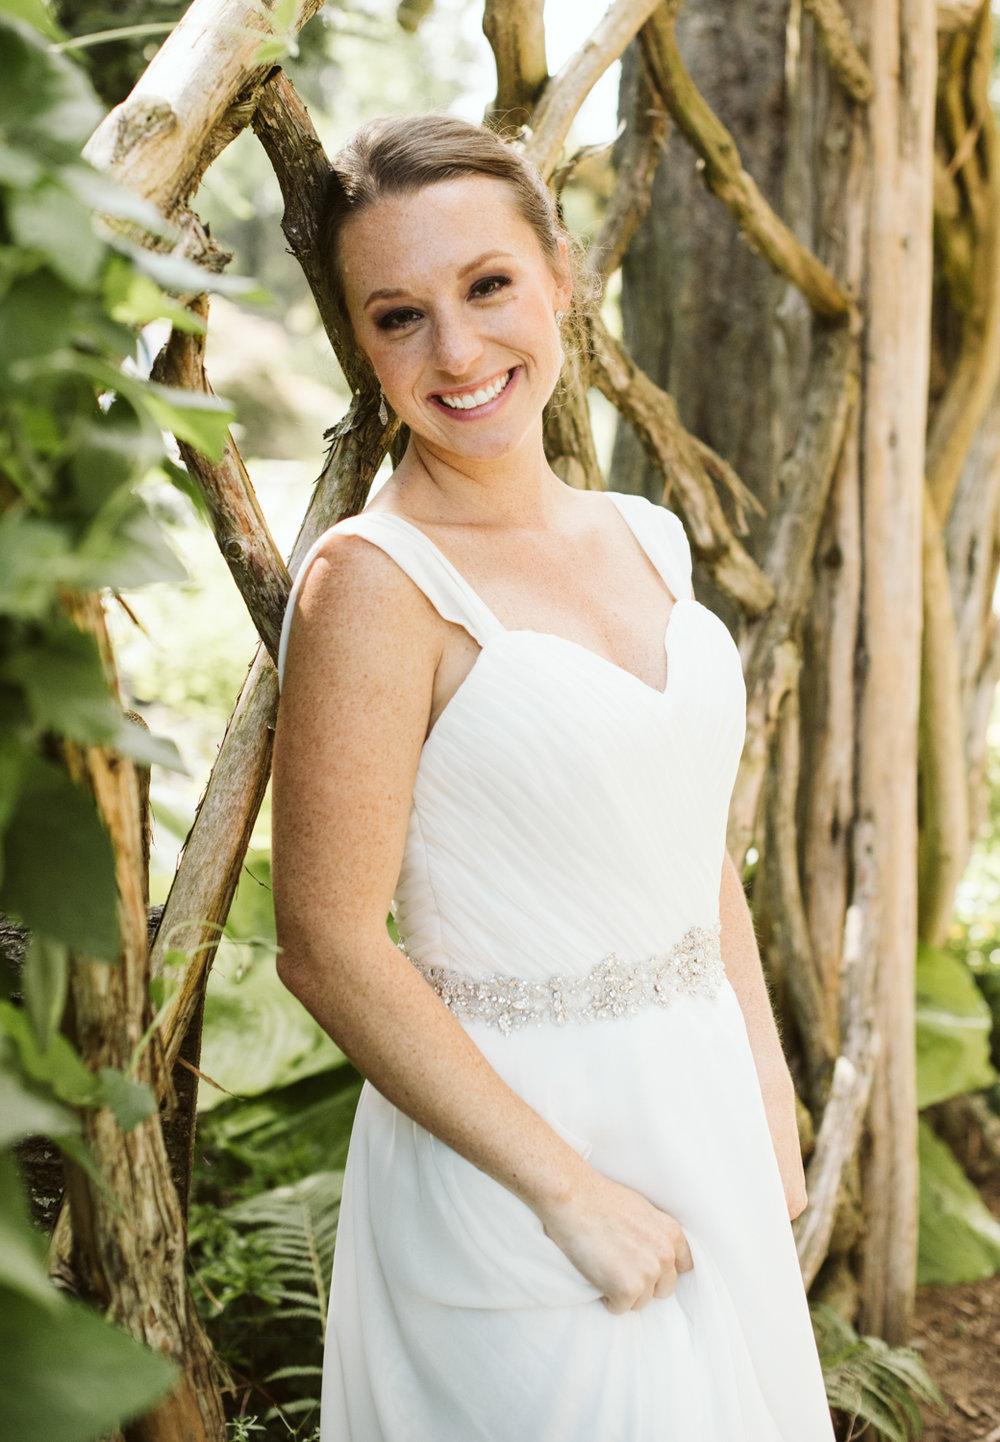 emily_alex_elm_bank_wedding_wellesley_DSC_6962.jpg